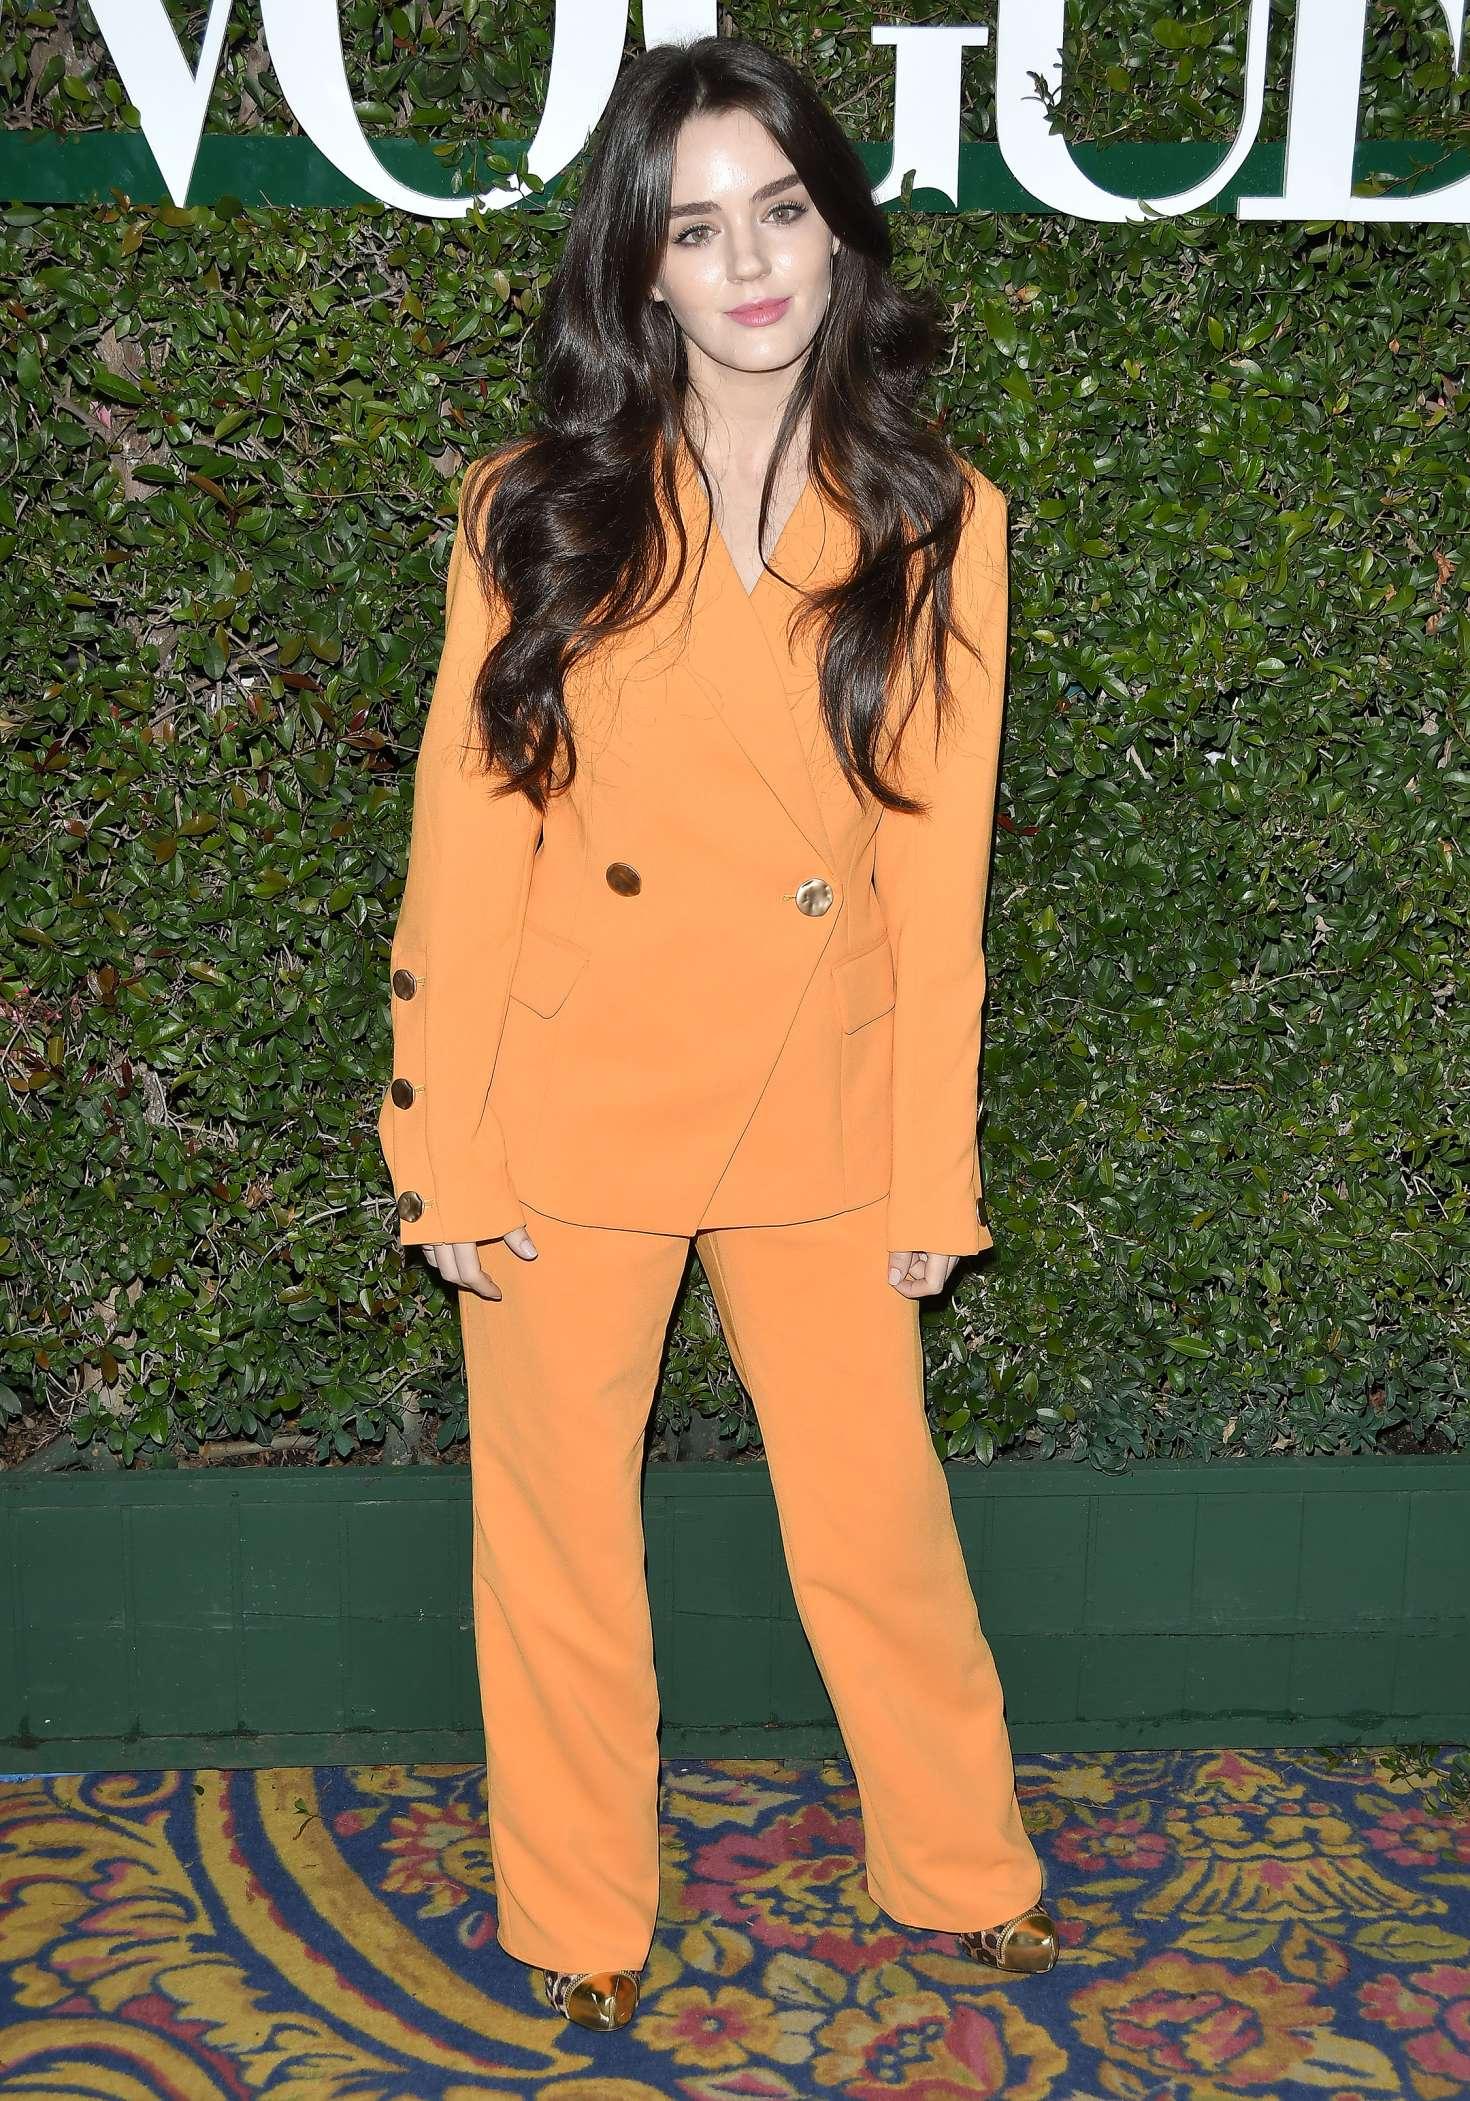 Dana Melanie 2019 : Dana Melanie: Teen Vogues 2019 Young Hollywood Party -02